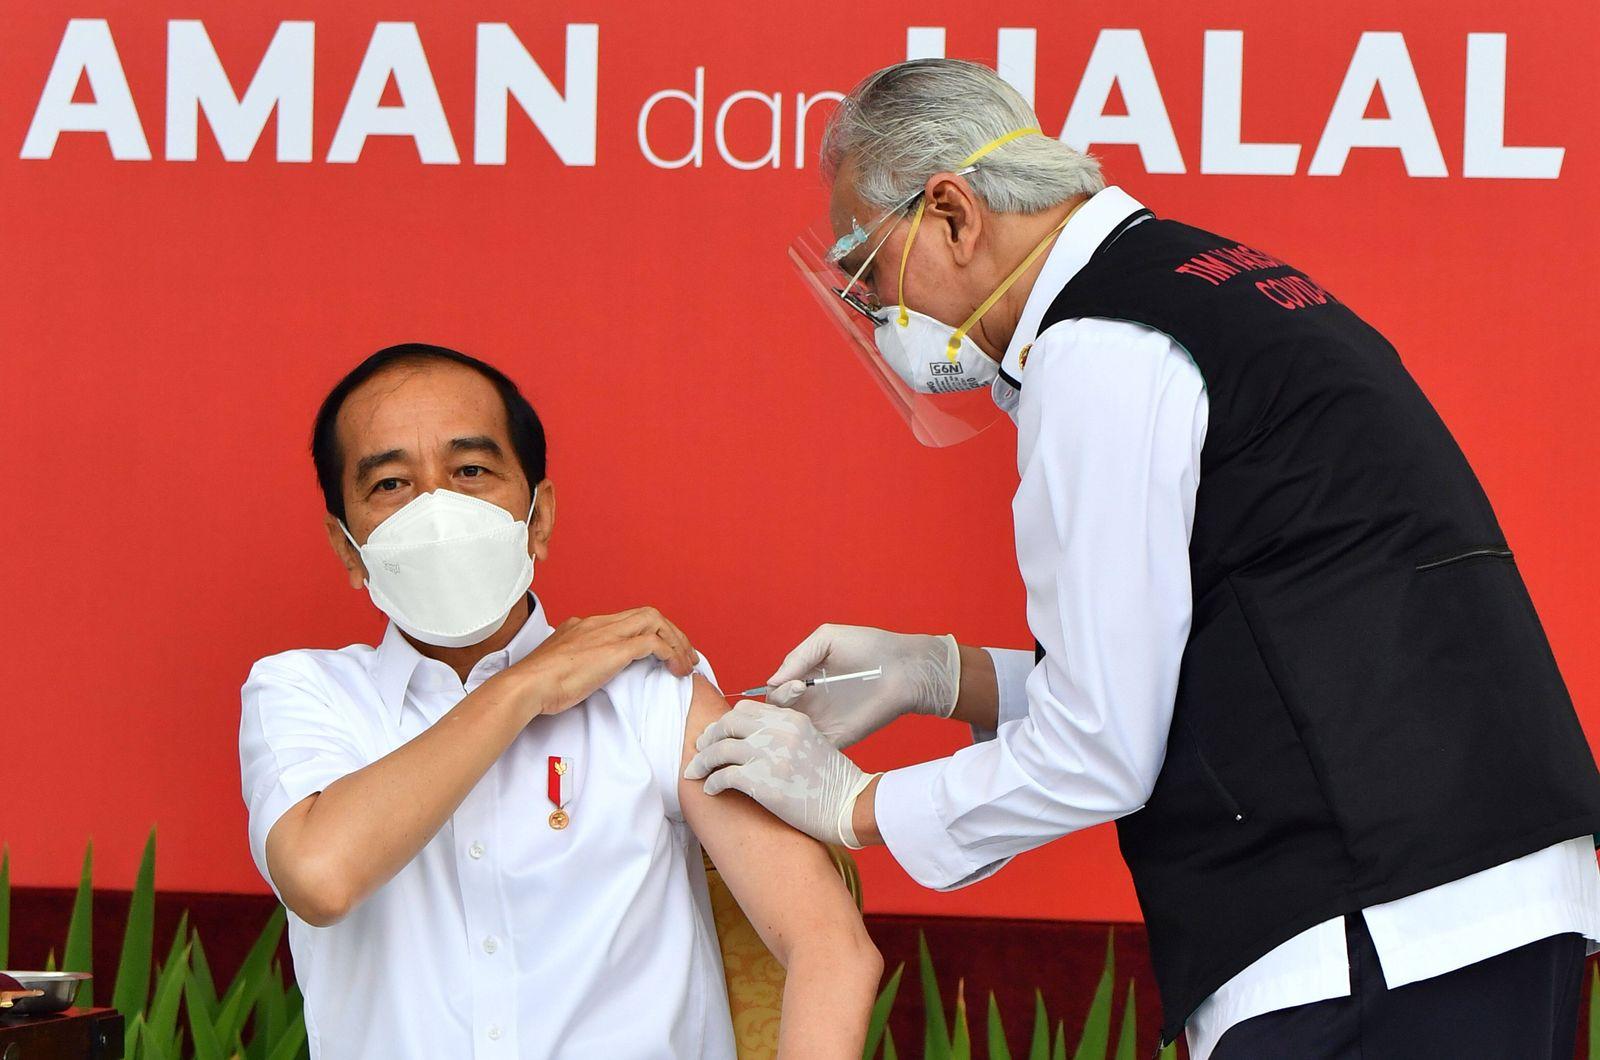 (210113) -- JAKARTA, Jan. 13, 2021 -- Indonesian President Joko Widodo receives the COVID-19 vaccine shot developed by C